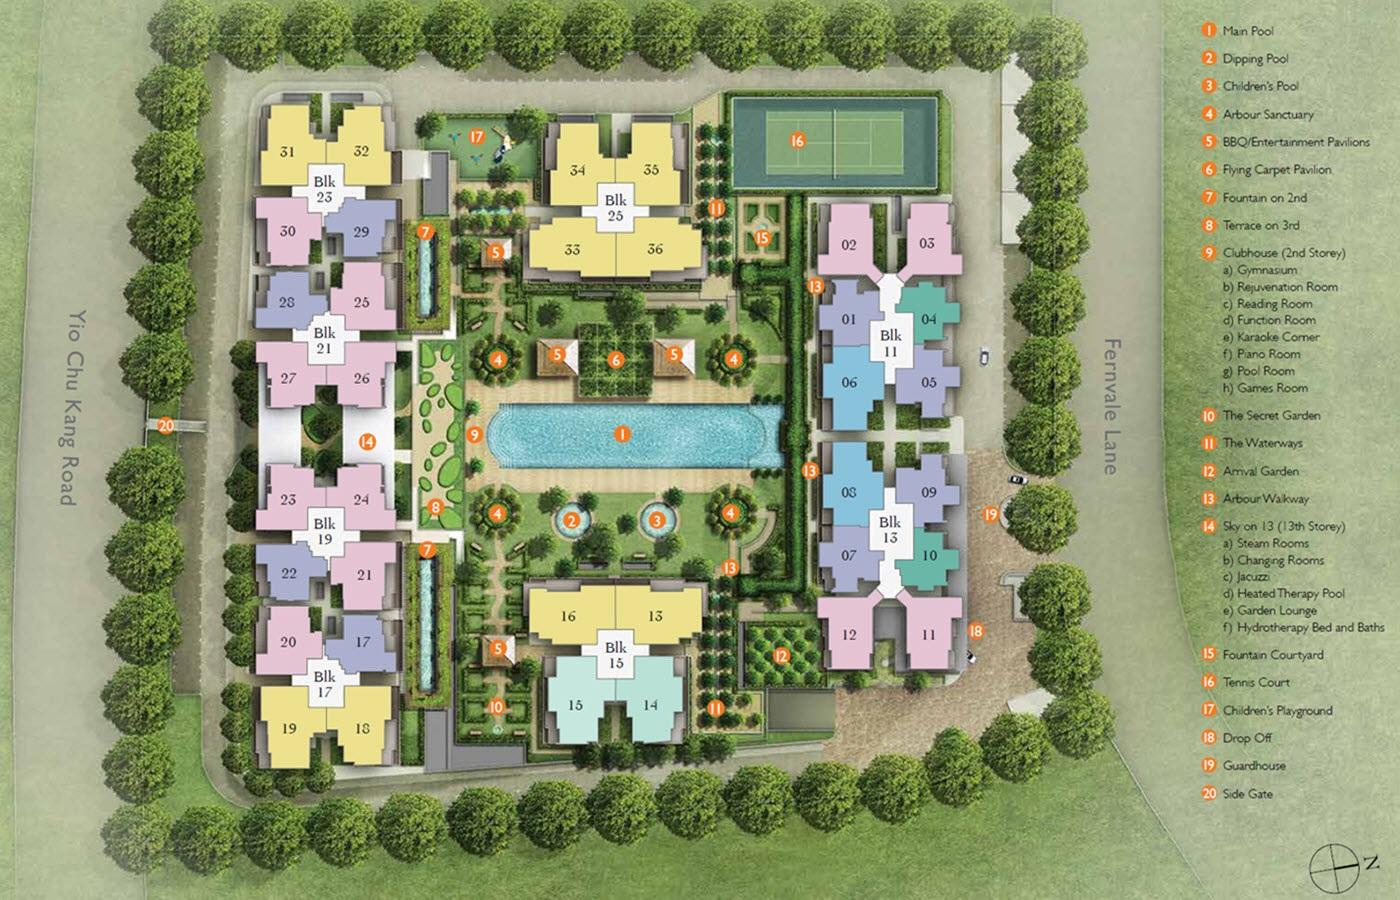 The Topiary EC Site Plan & Facilities Plan